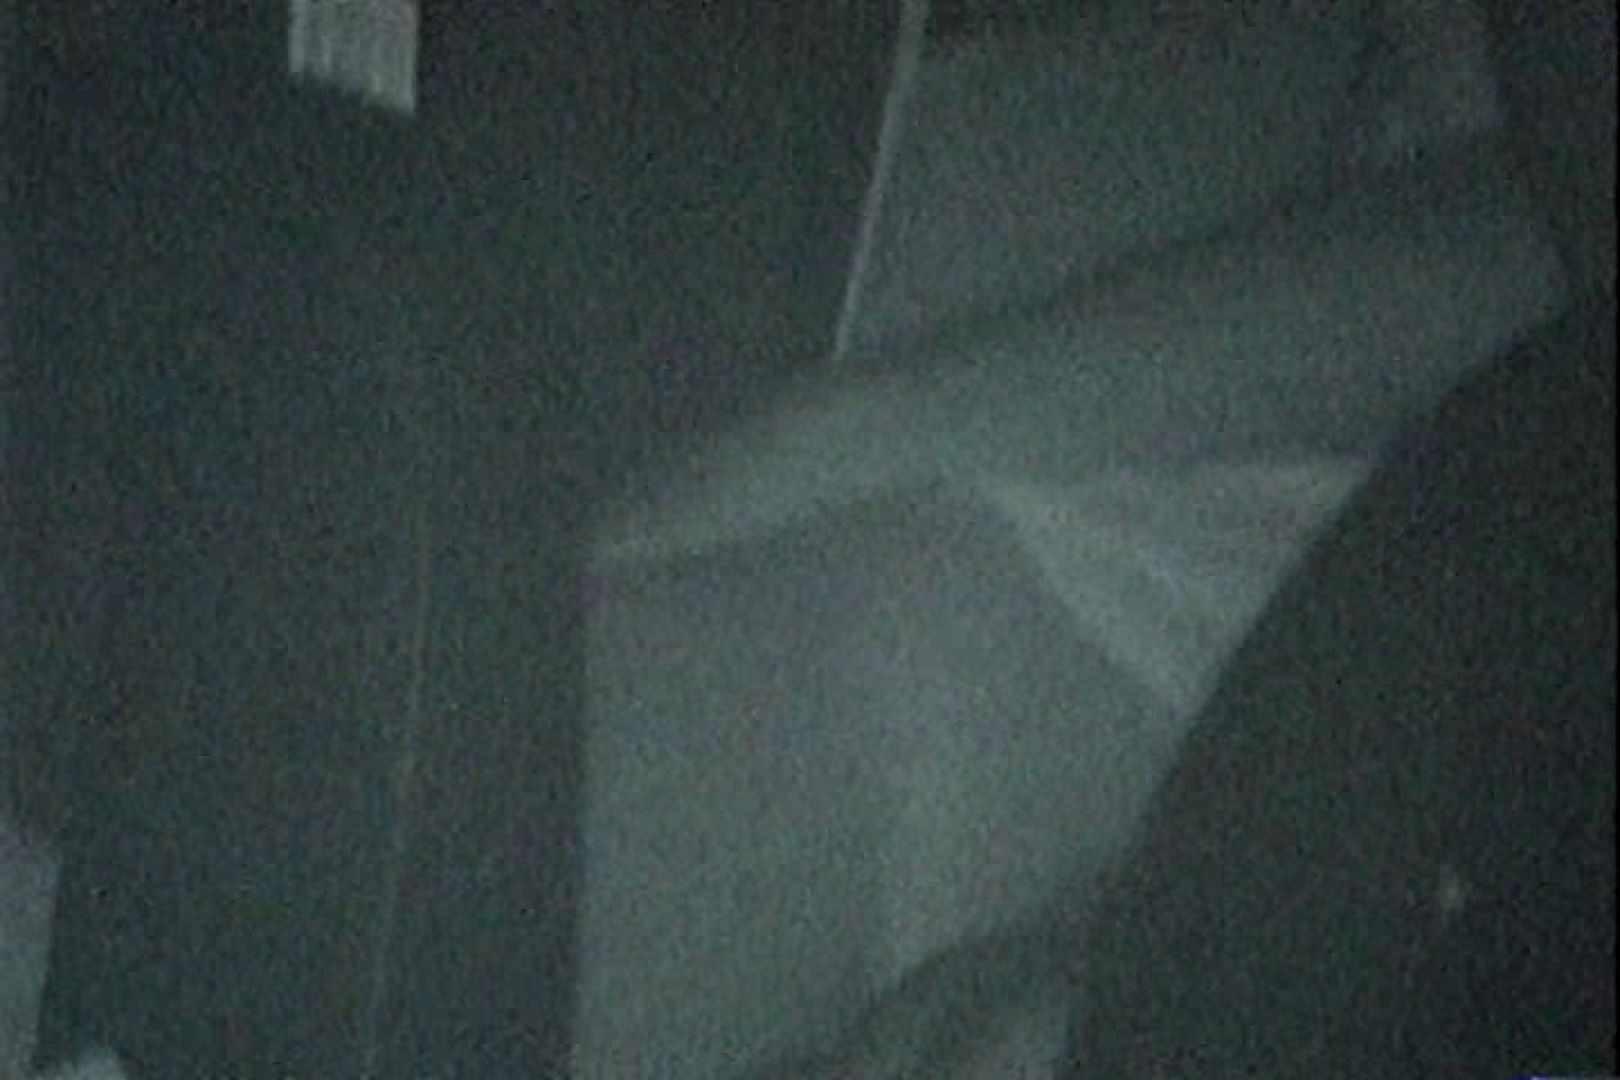 充血監督の深夜の運動会Vol.144 車 戯れ無修正画像 100画像 55